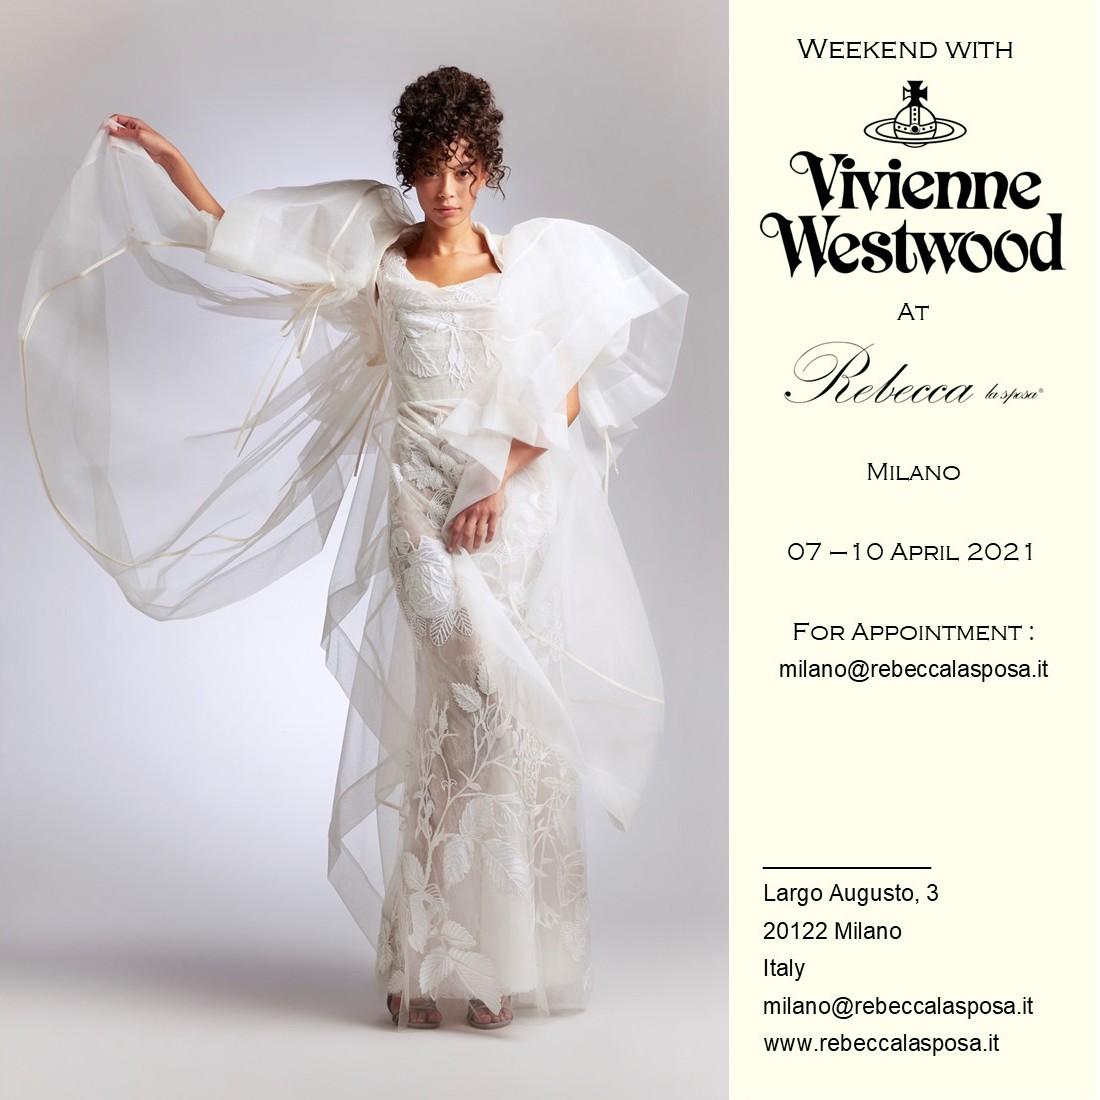 Rebecca La Sposa - Vivienne Westwood